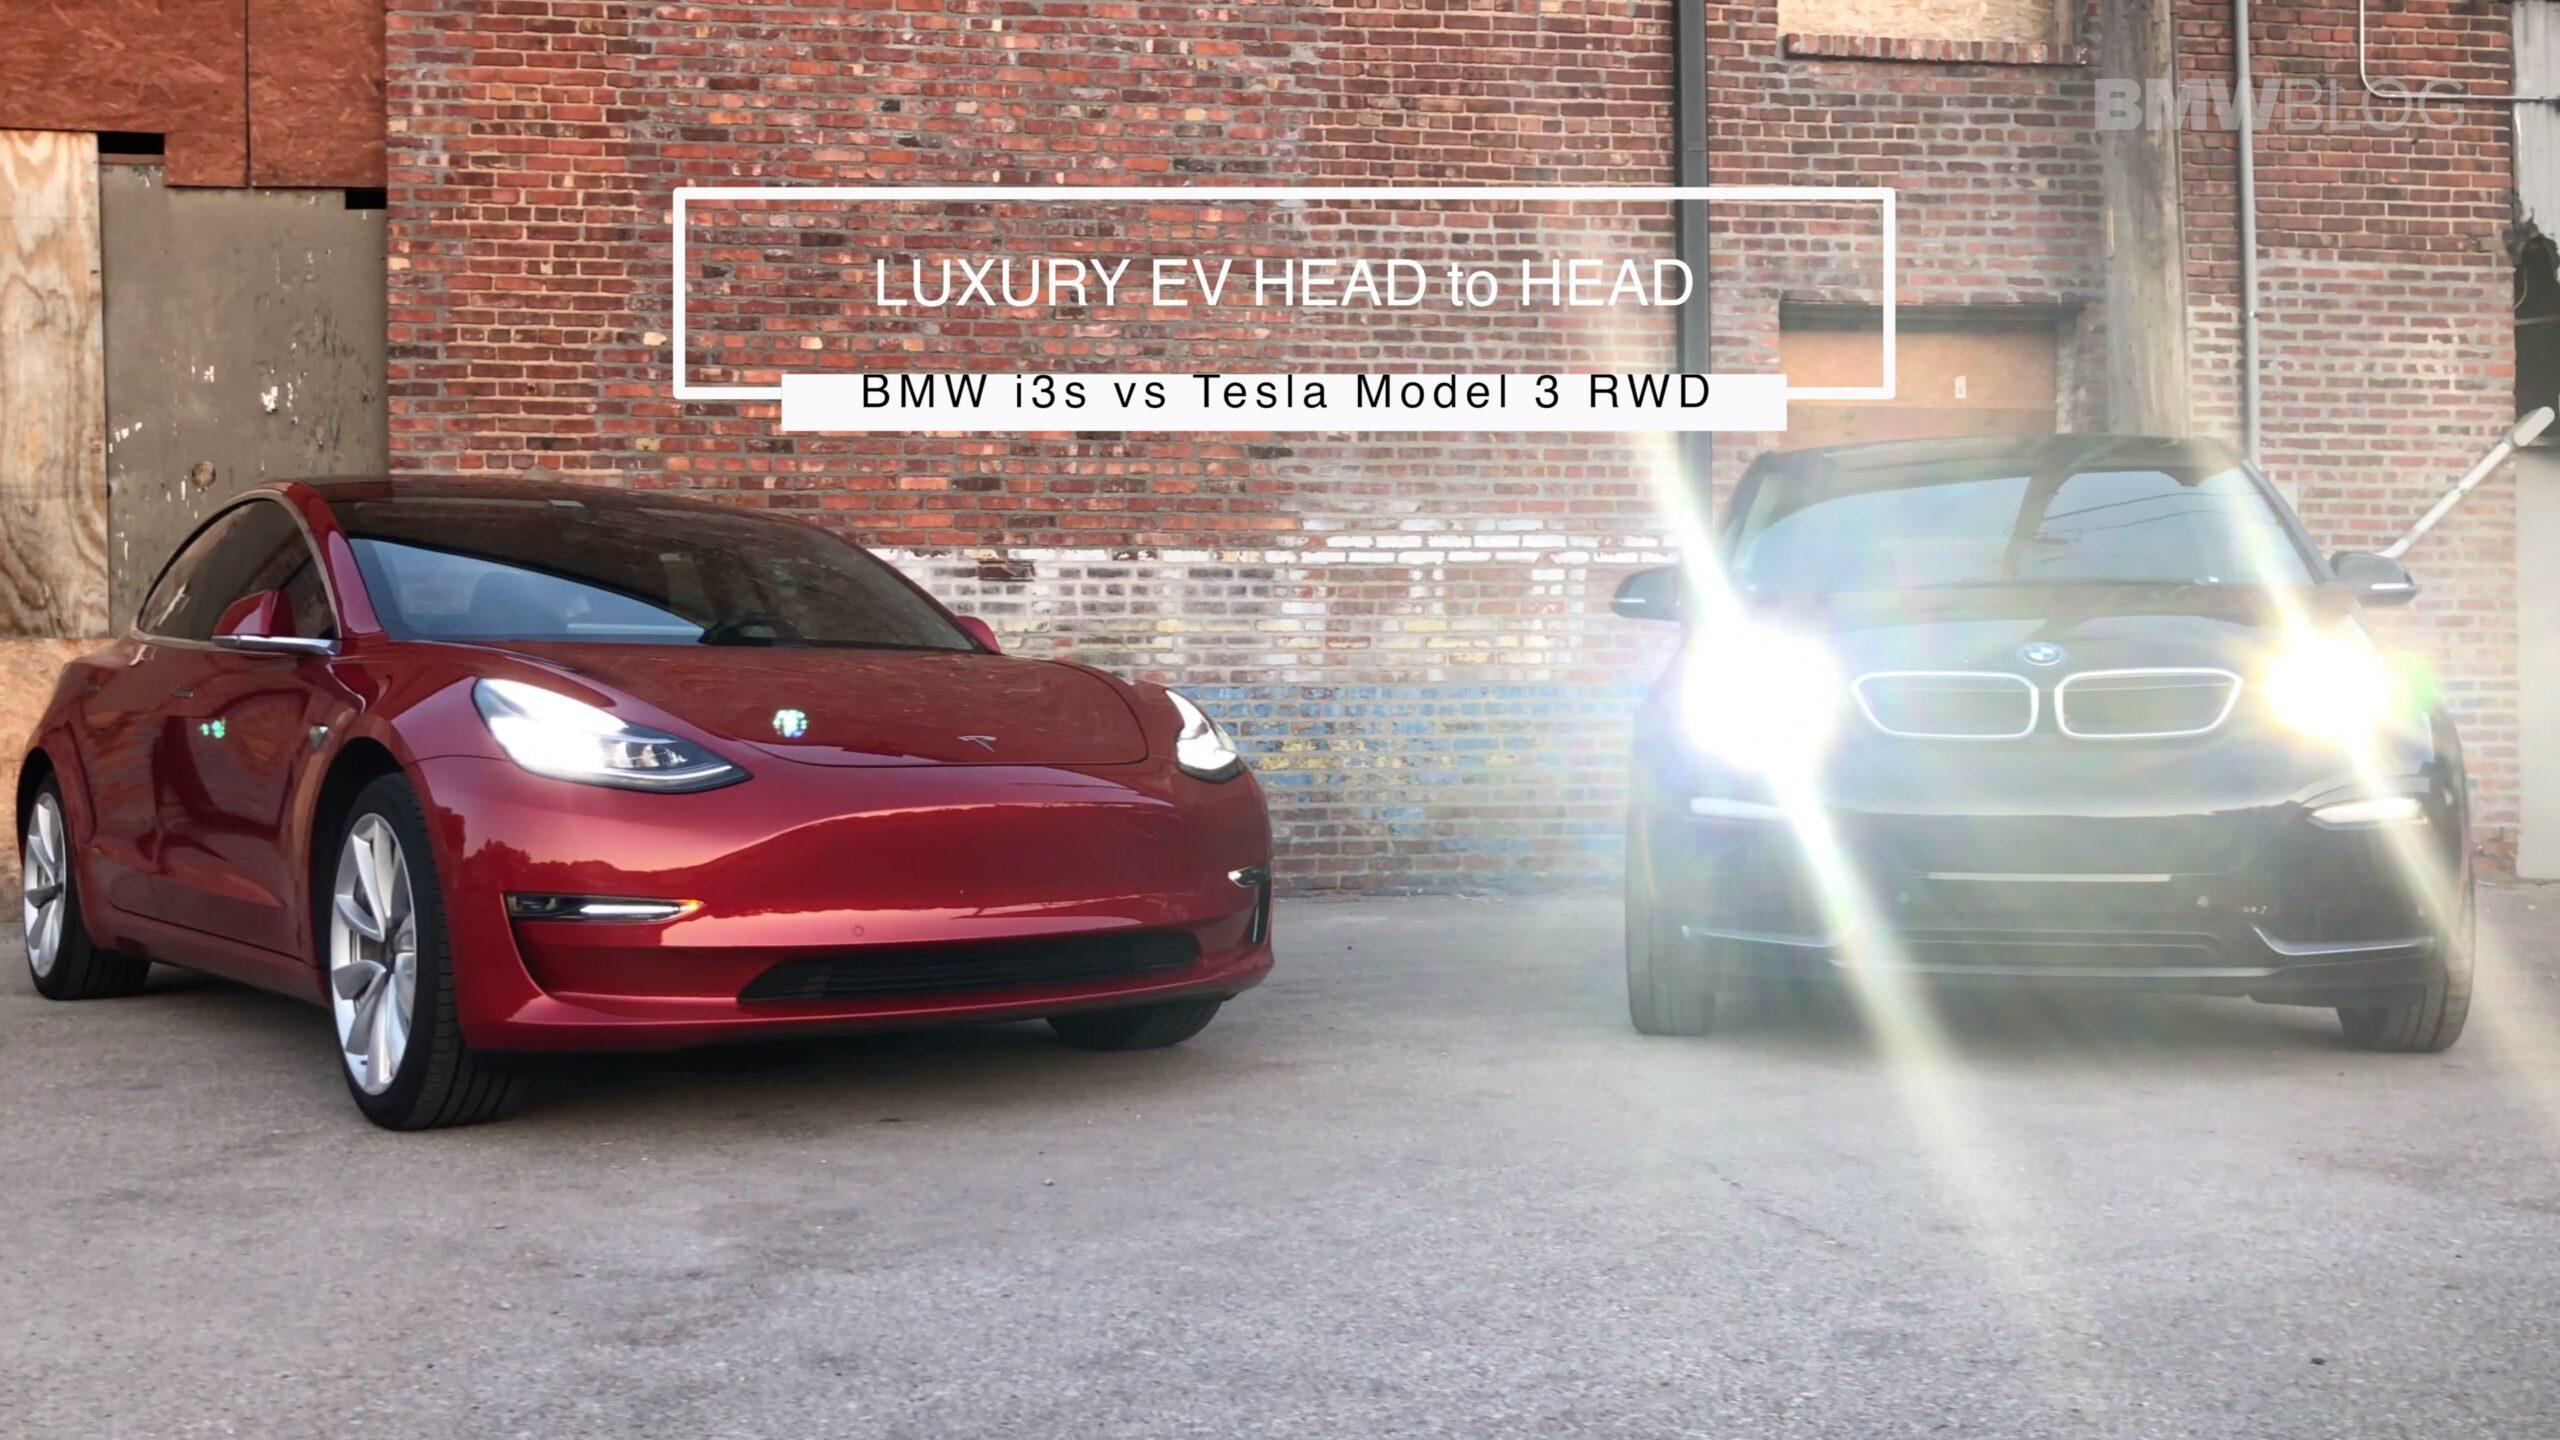 BMW i3 vs Tesla Model 3 - Which One Should I Buy?